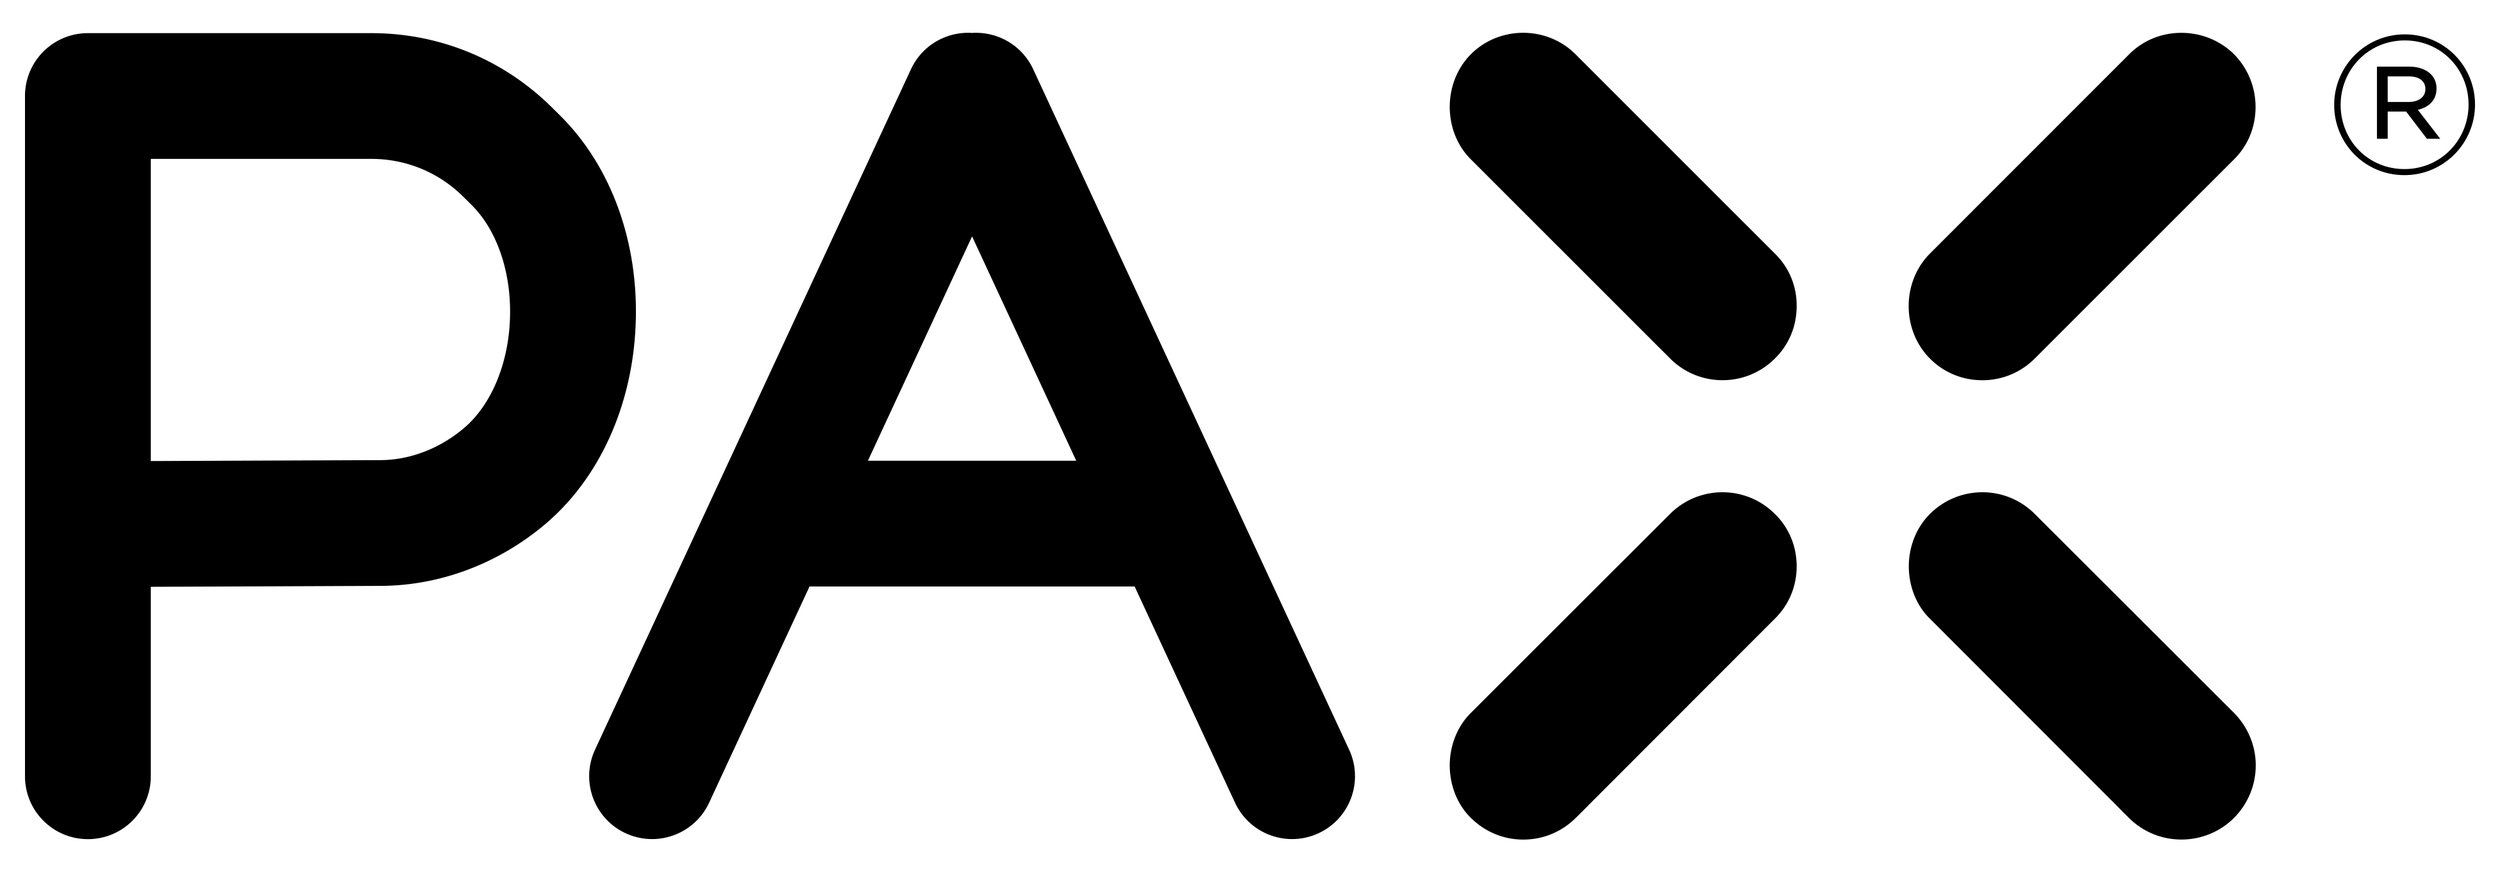 Final_PAX_Logo_919_Black (1).jpg